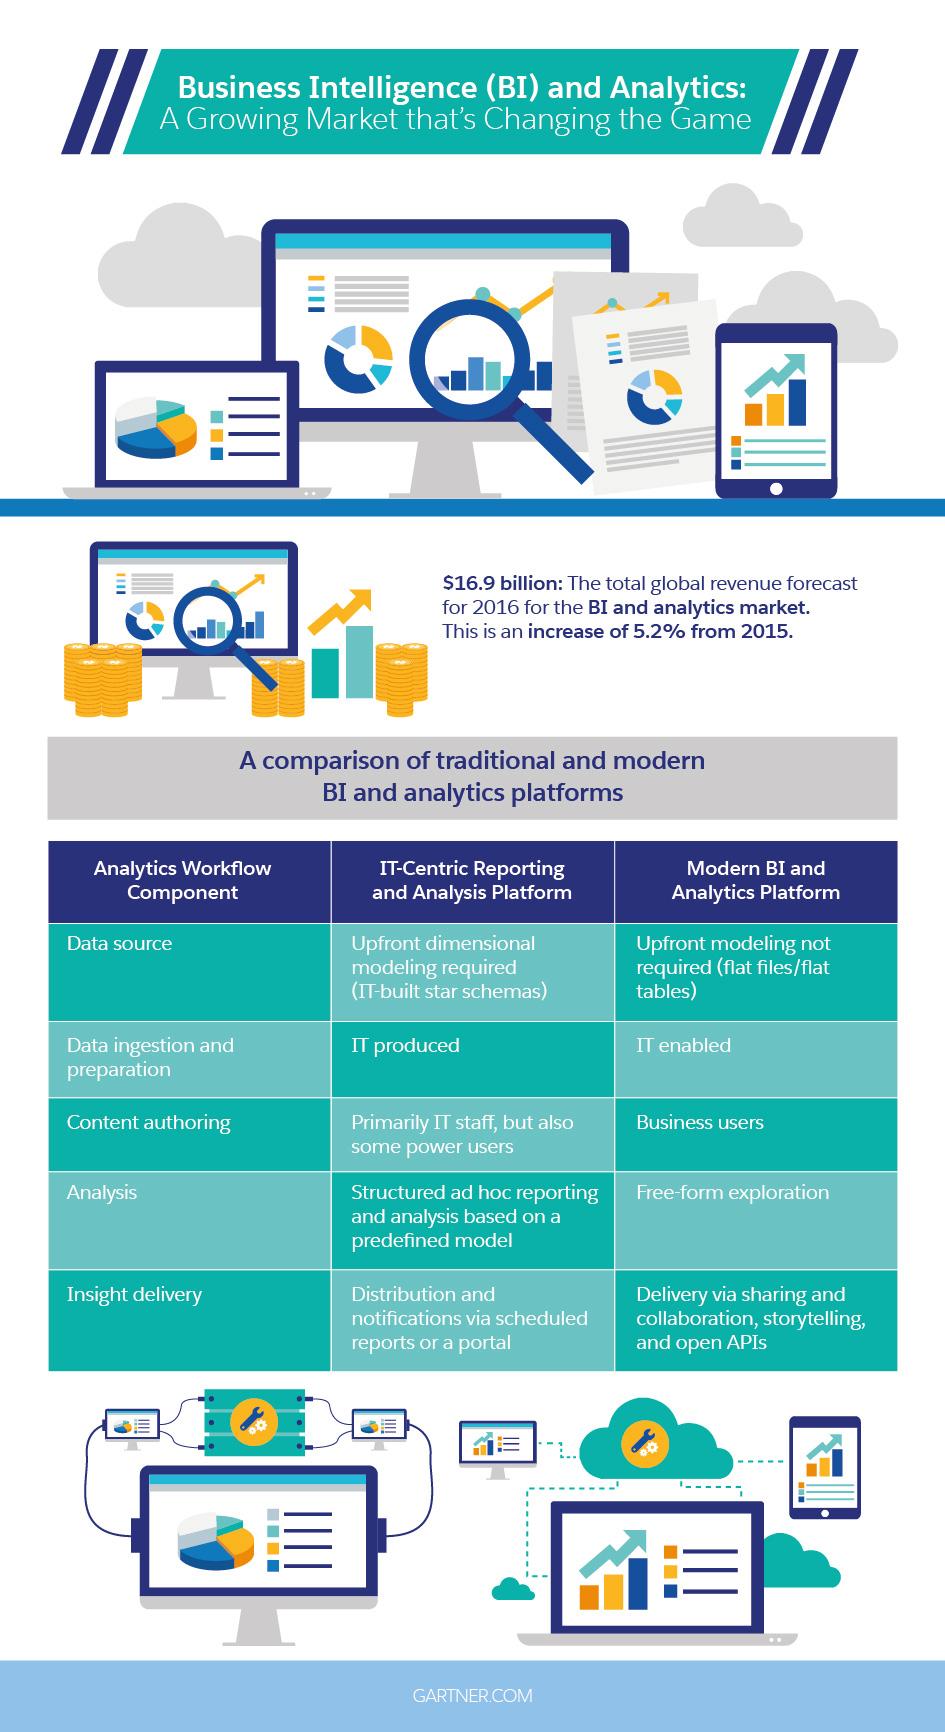 Business Intelligence (BI) and Analytics